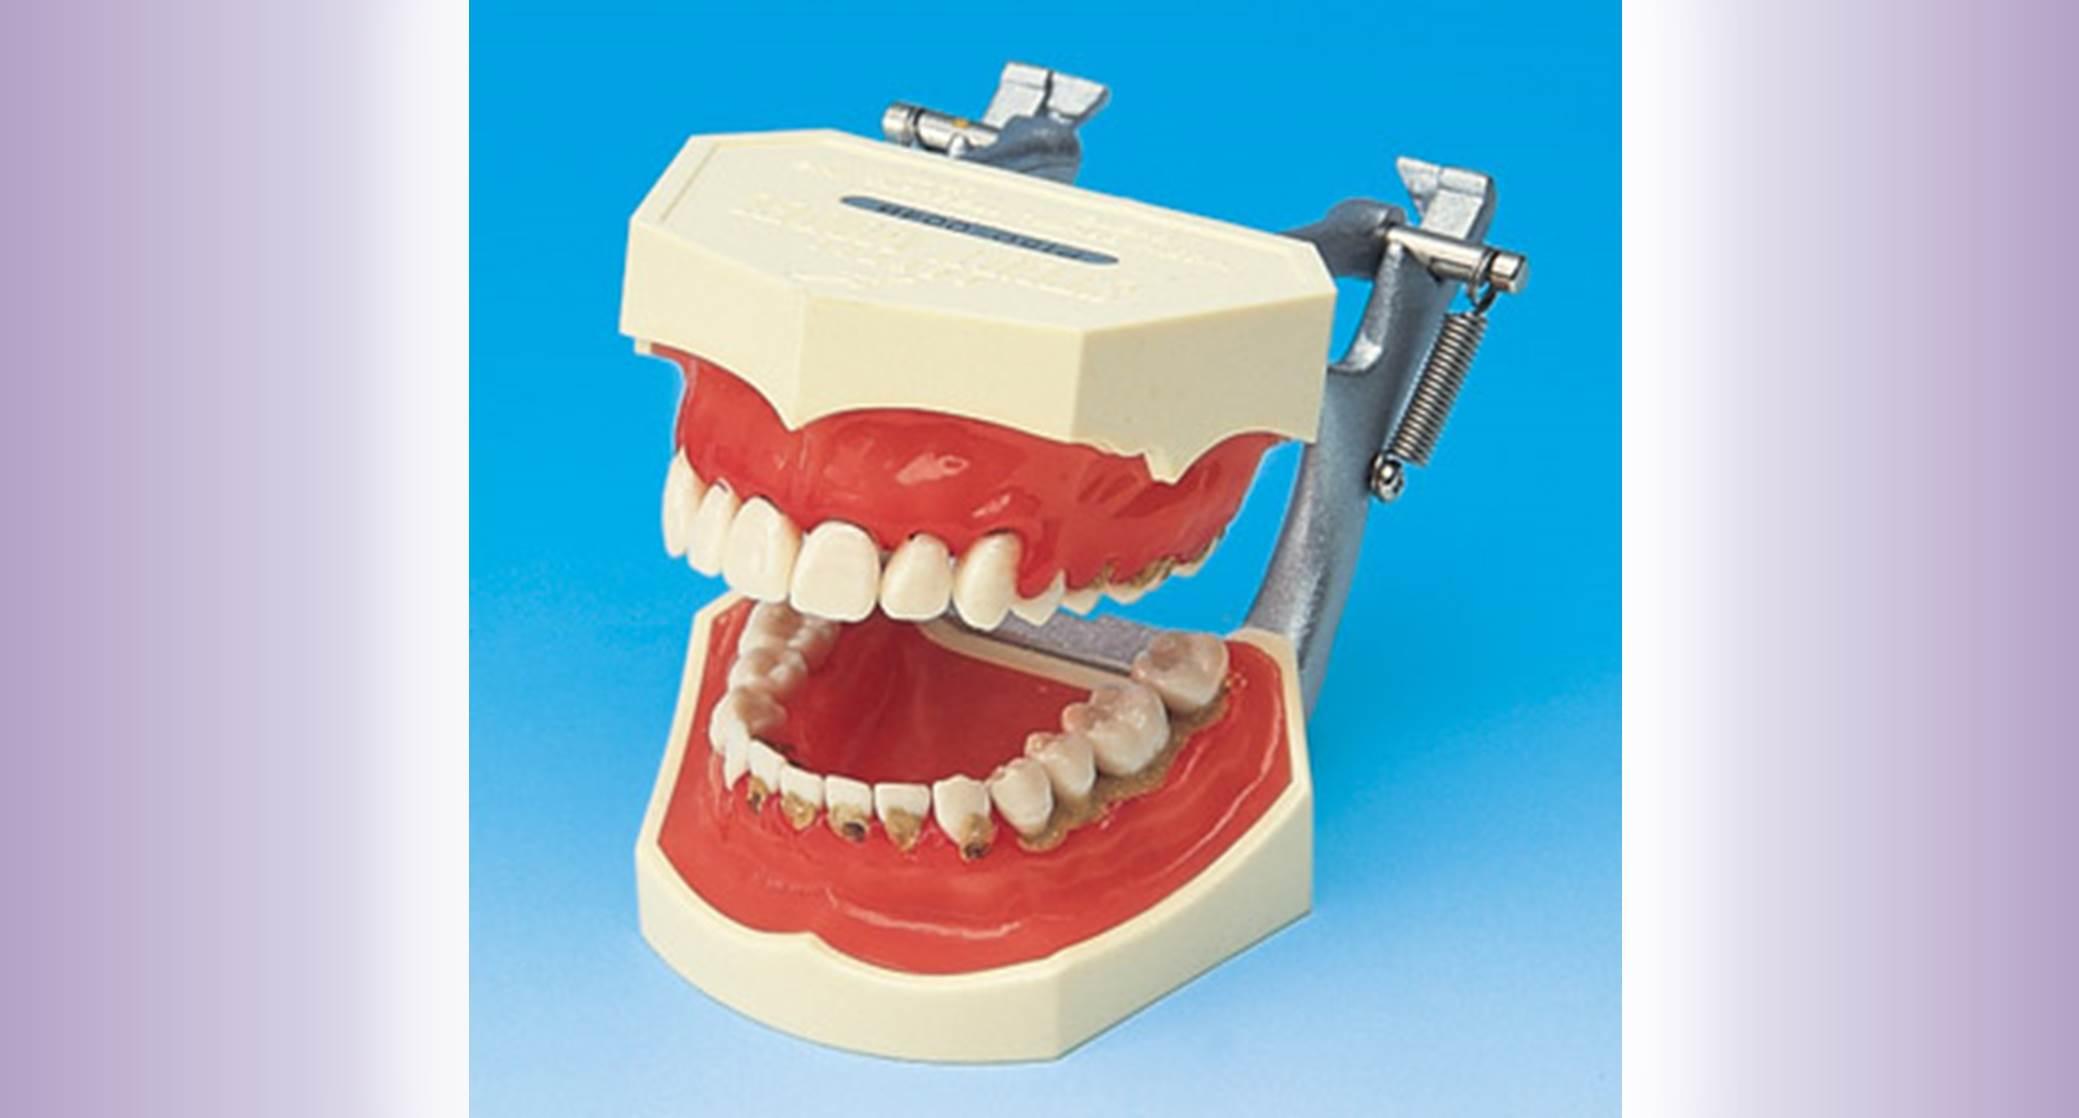 Periodontics widget